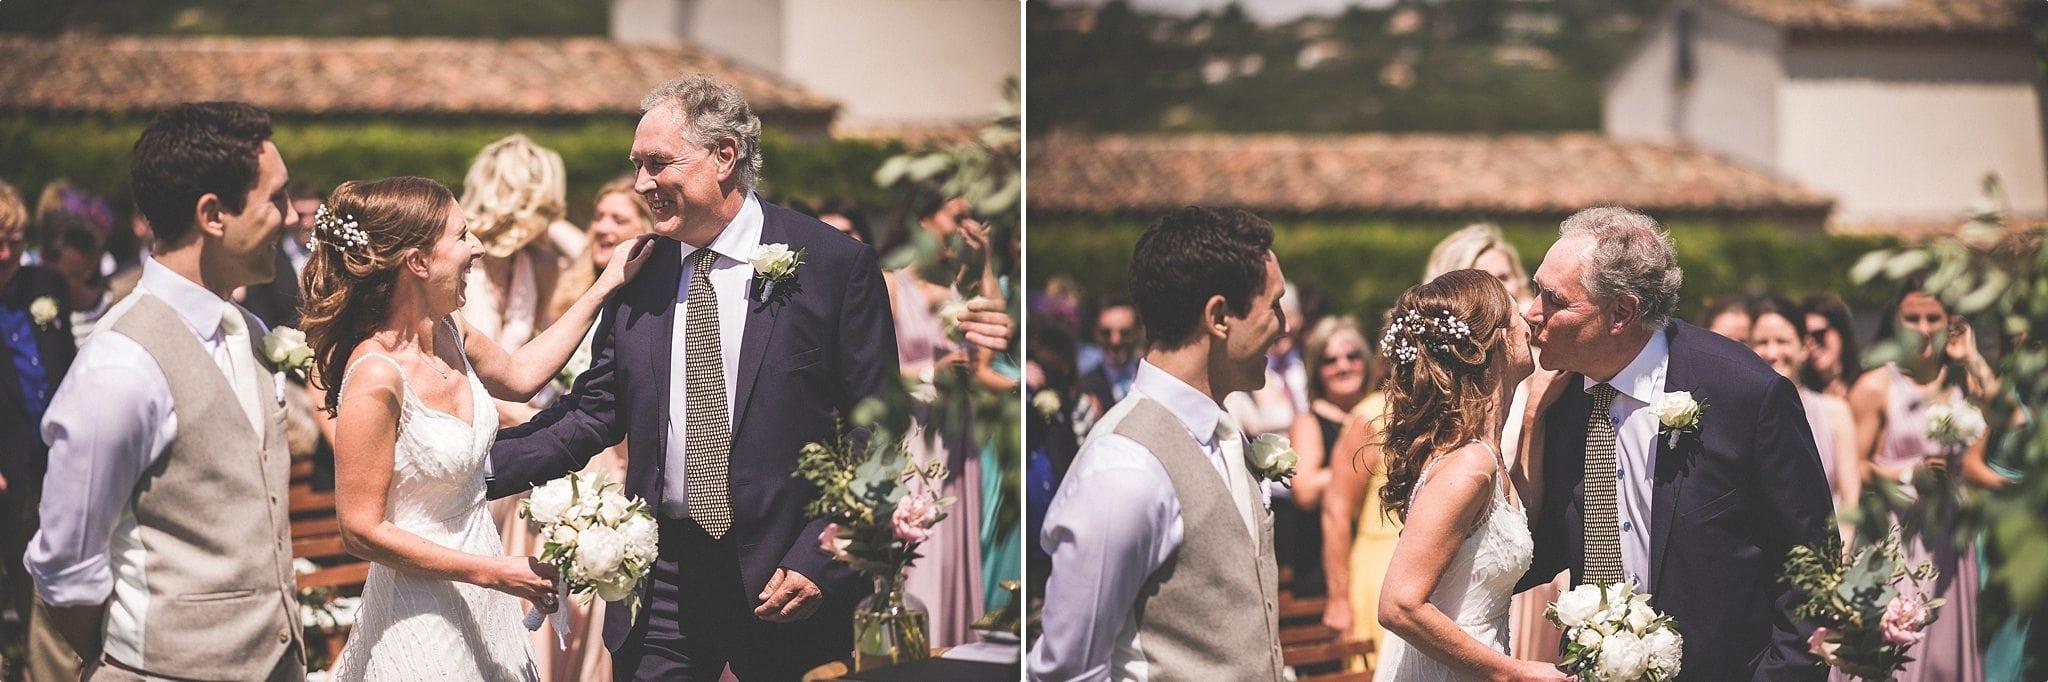 Domaine de la Croix - Wedding - Maria Assia Photography-147